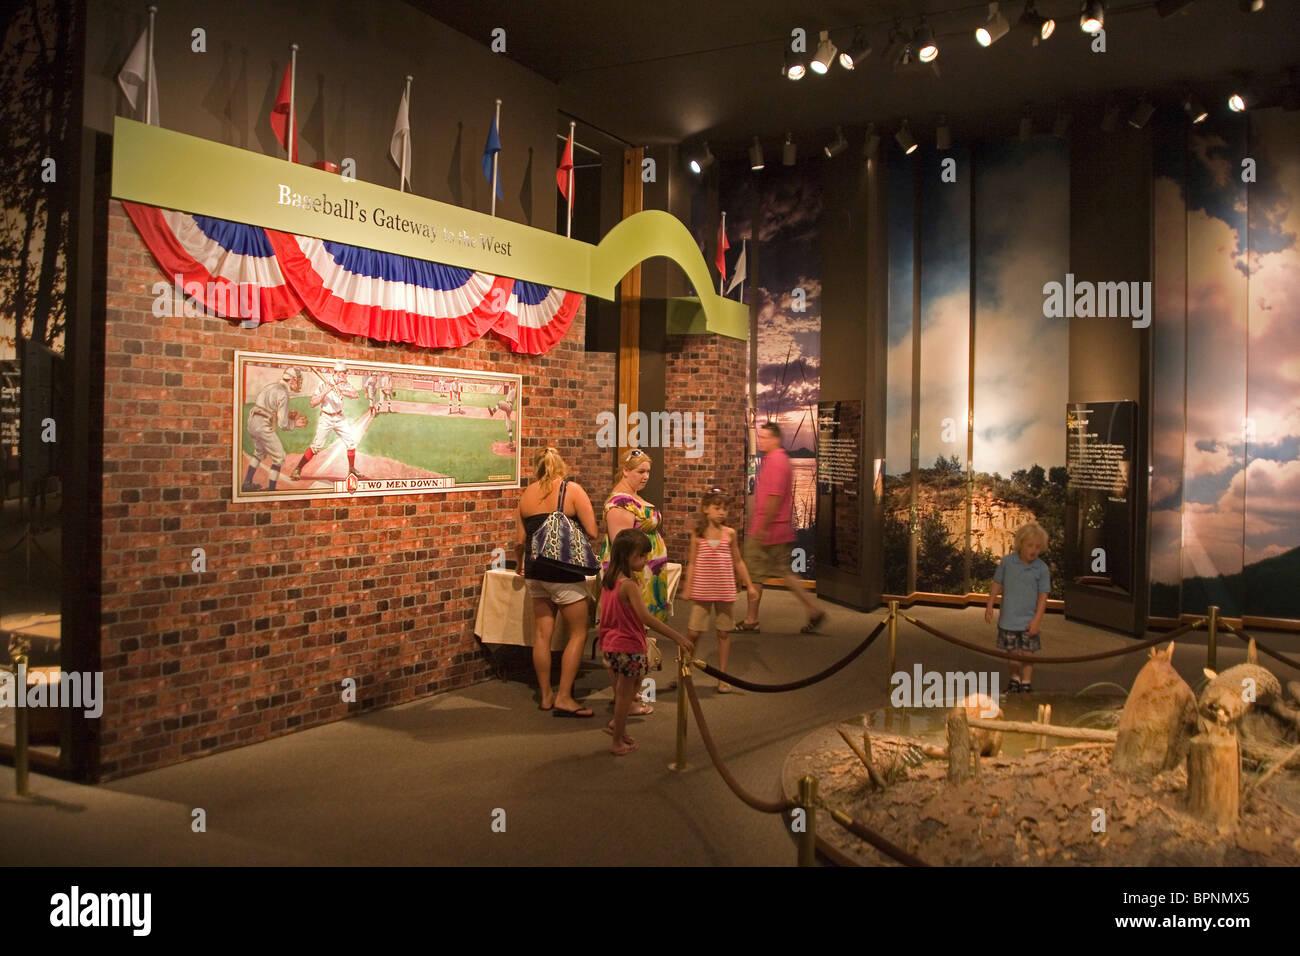 Baseball museum at St. Louis Gateway Arch - Stock Image